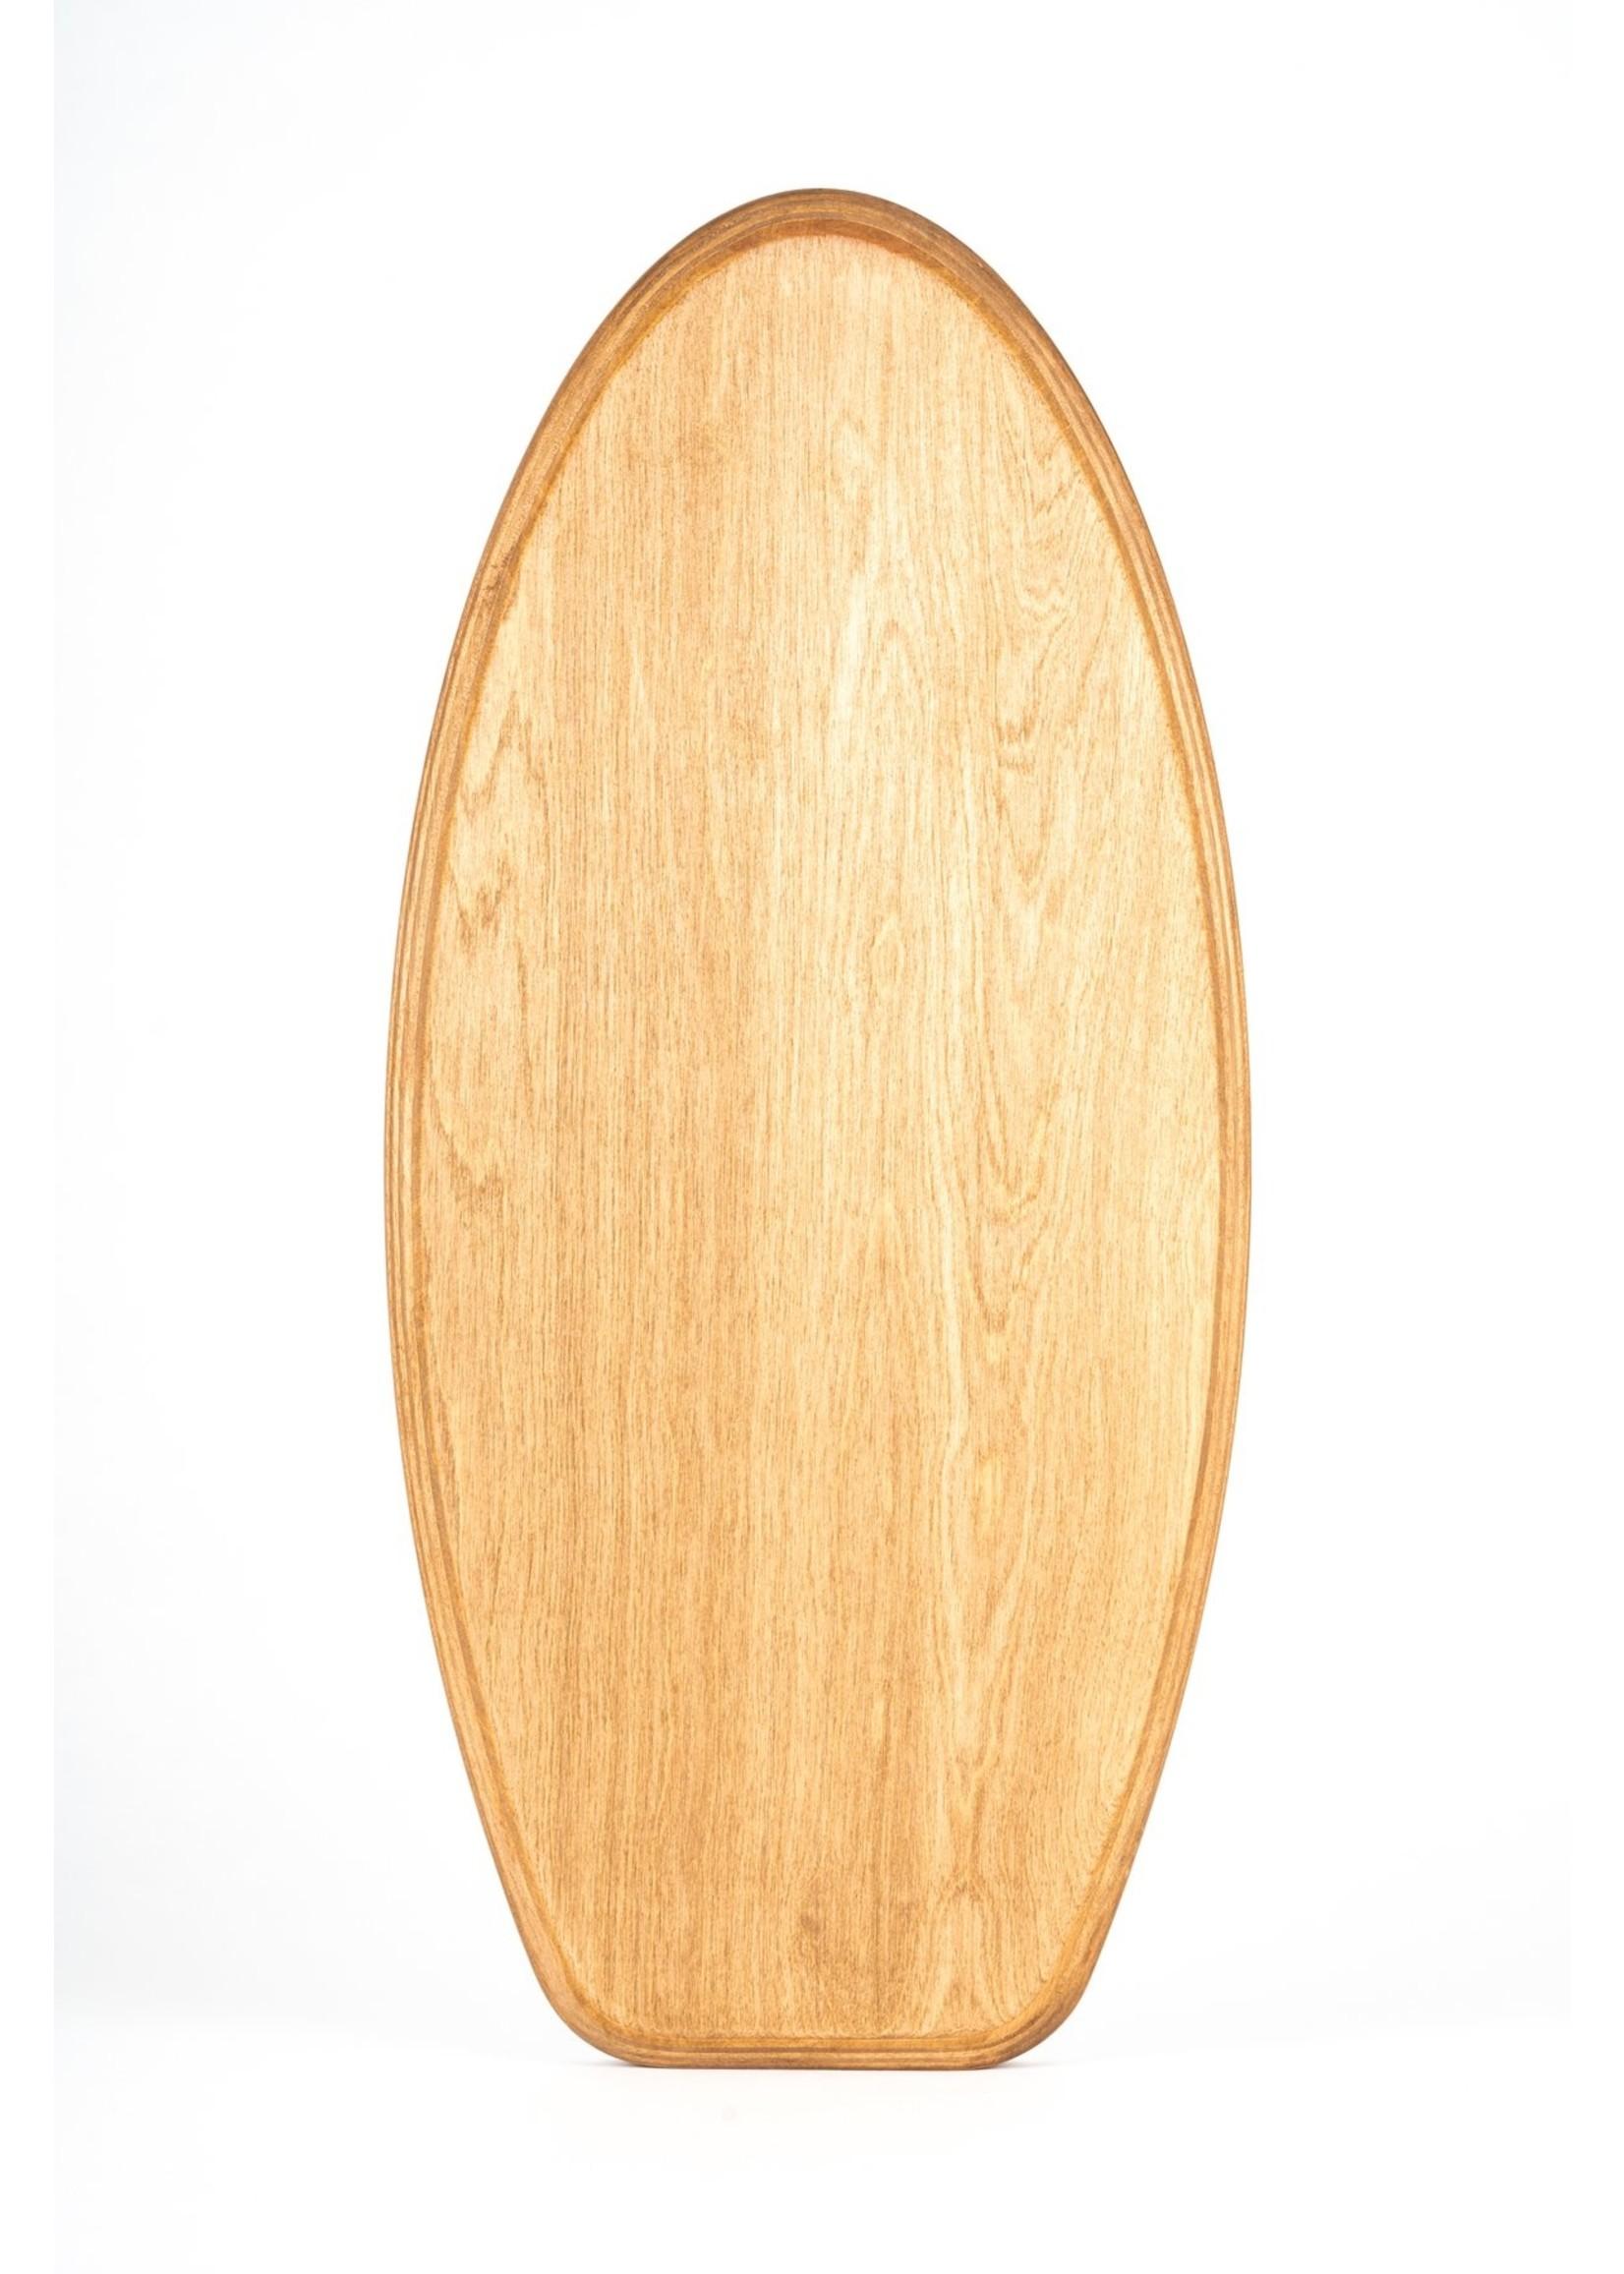 Montreal B-Board SUP SHAPE